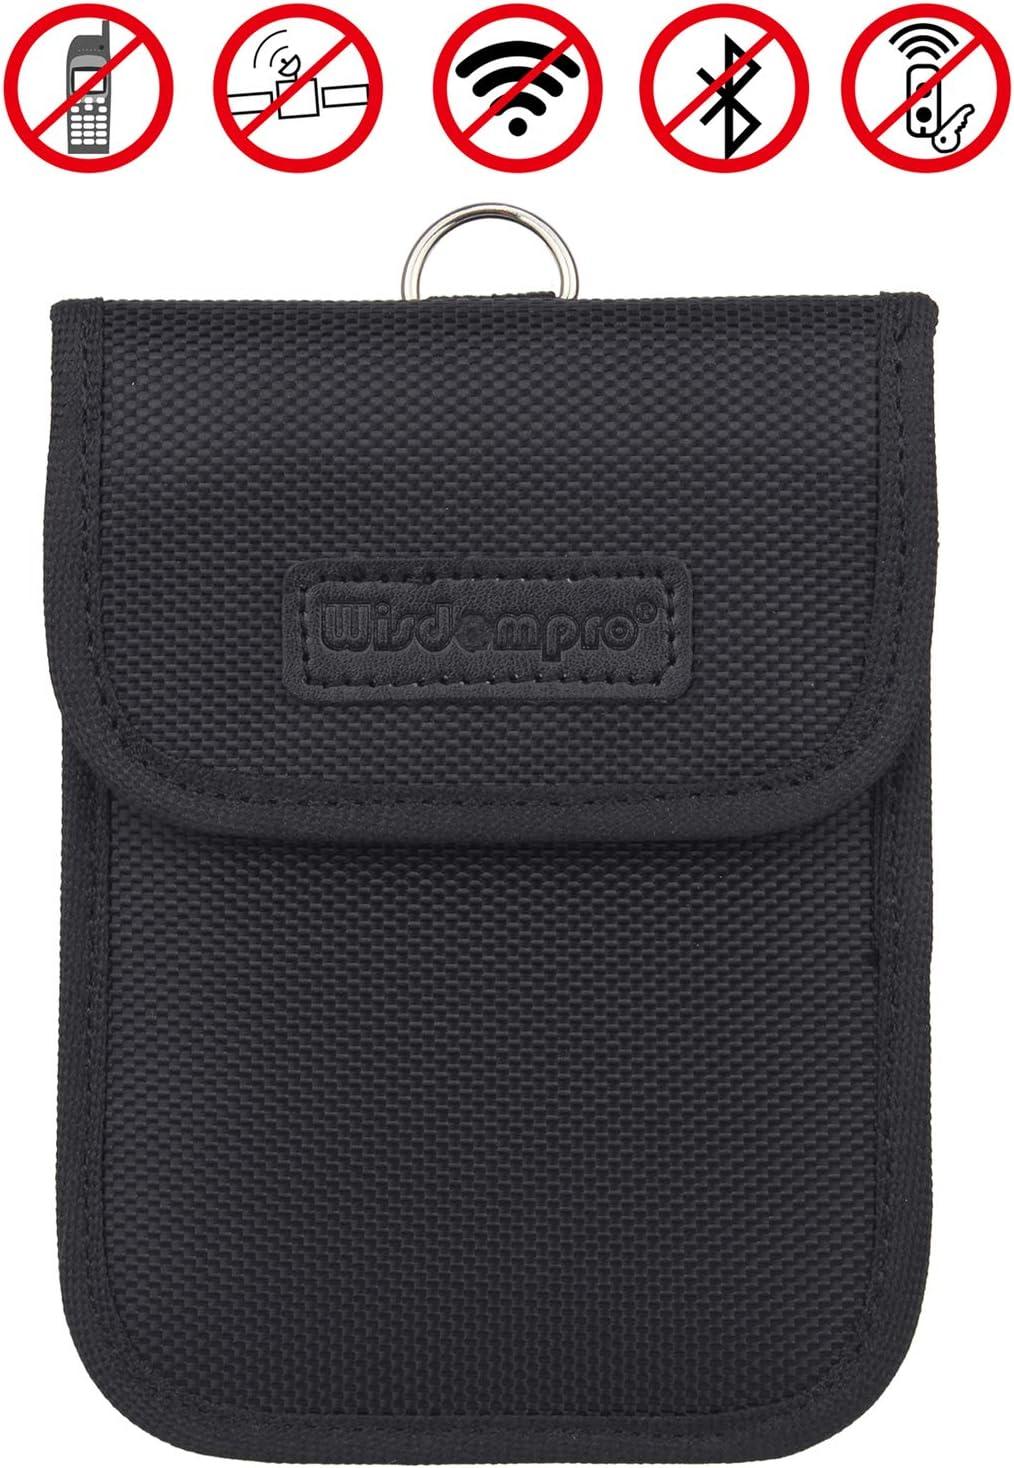 Faraday Bag for Key Fob, Wisdompro RFID Key Fob Protector RF Car Signal Blocking, Anti-Theft Pouch, Anti-Hacking Case Blocker - Black